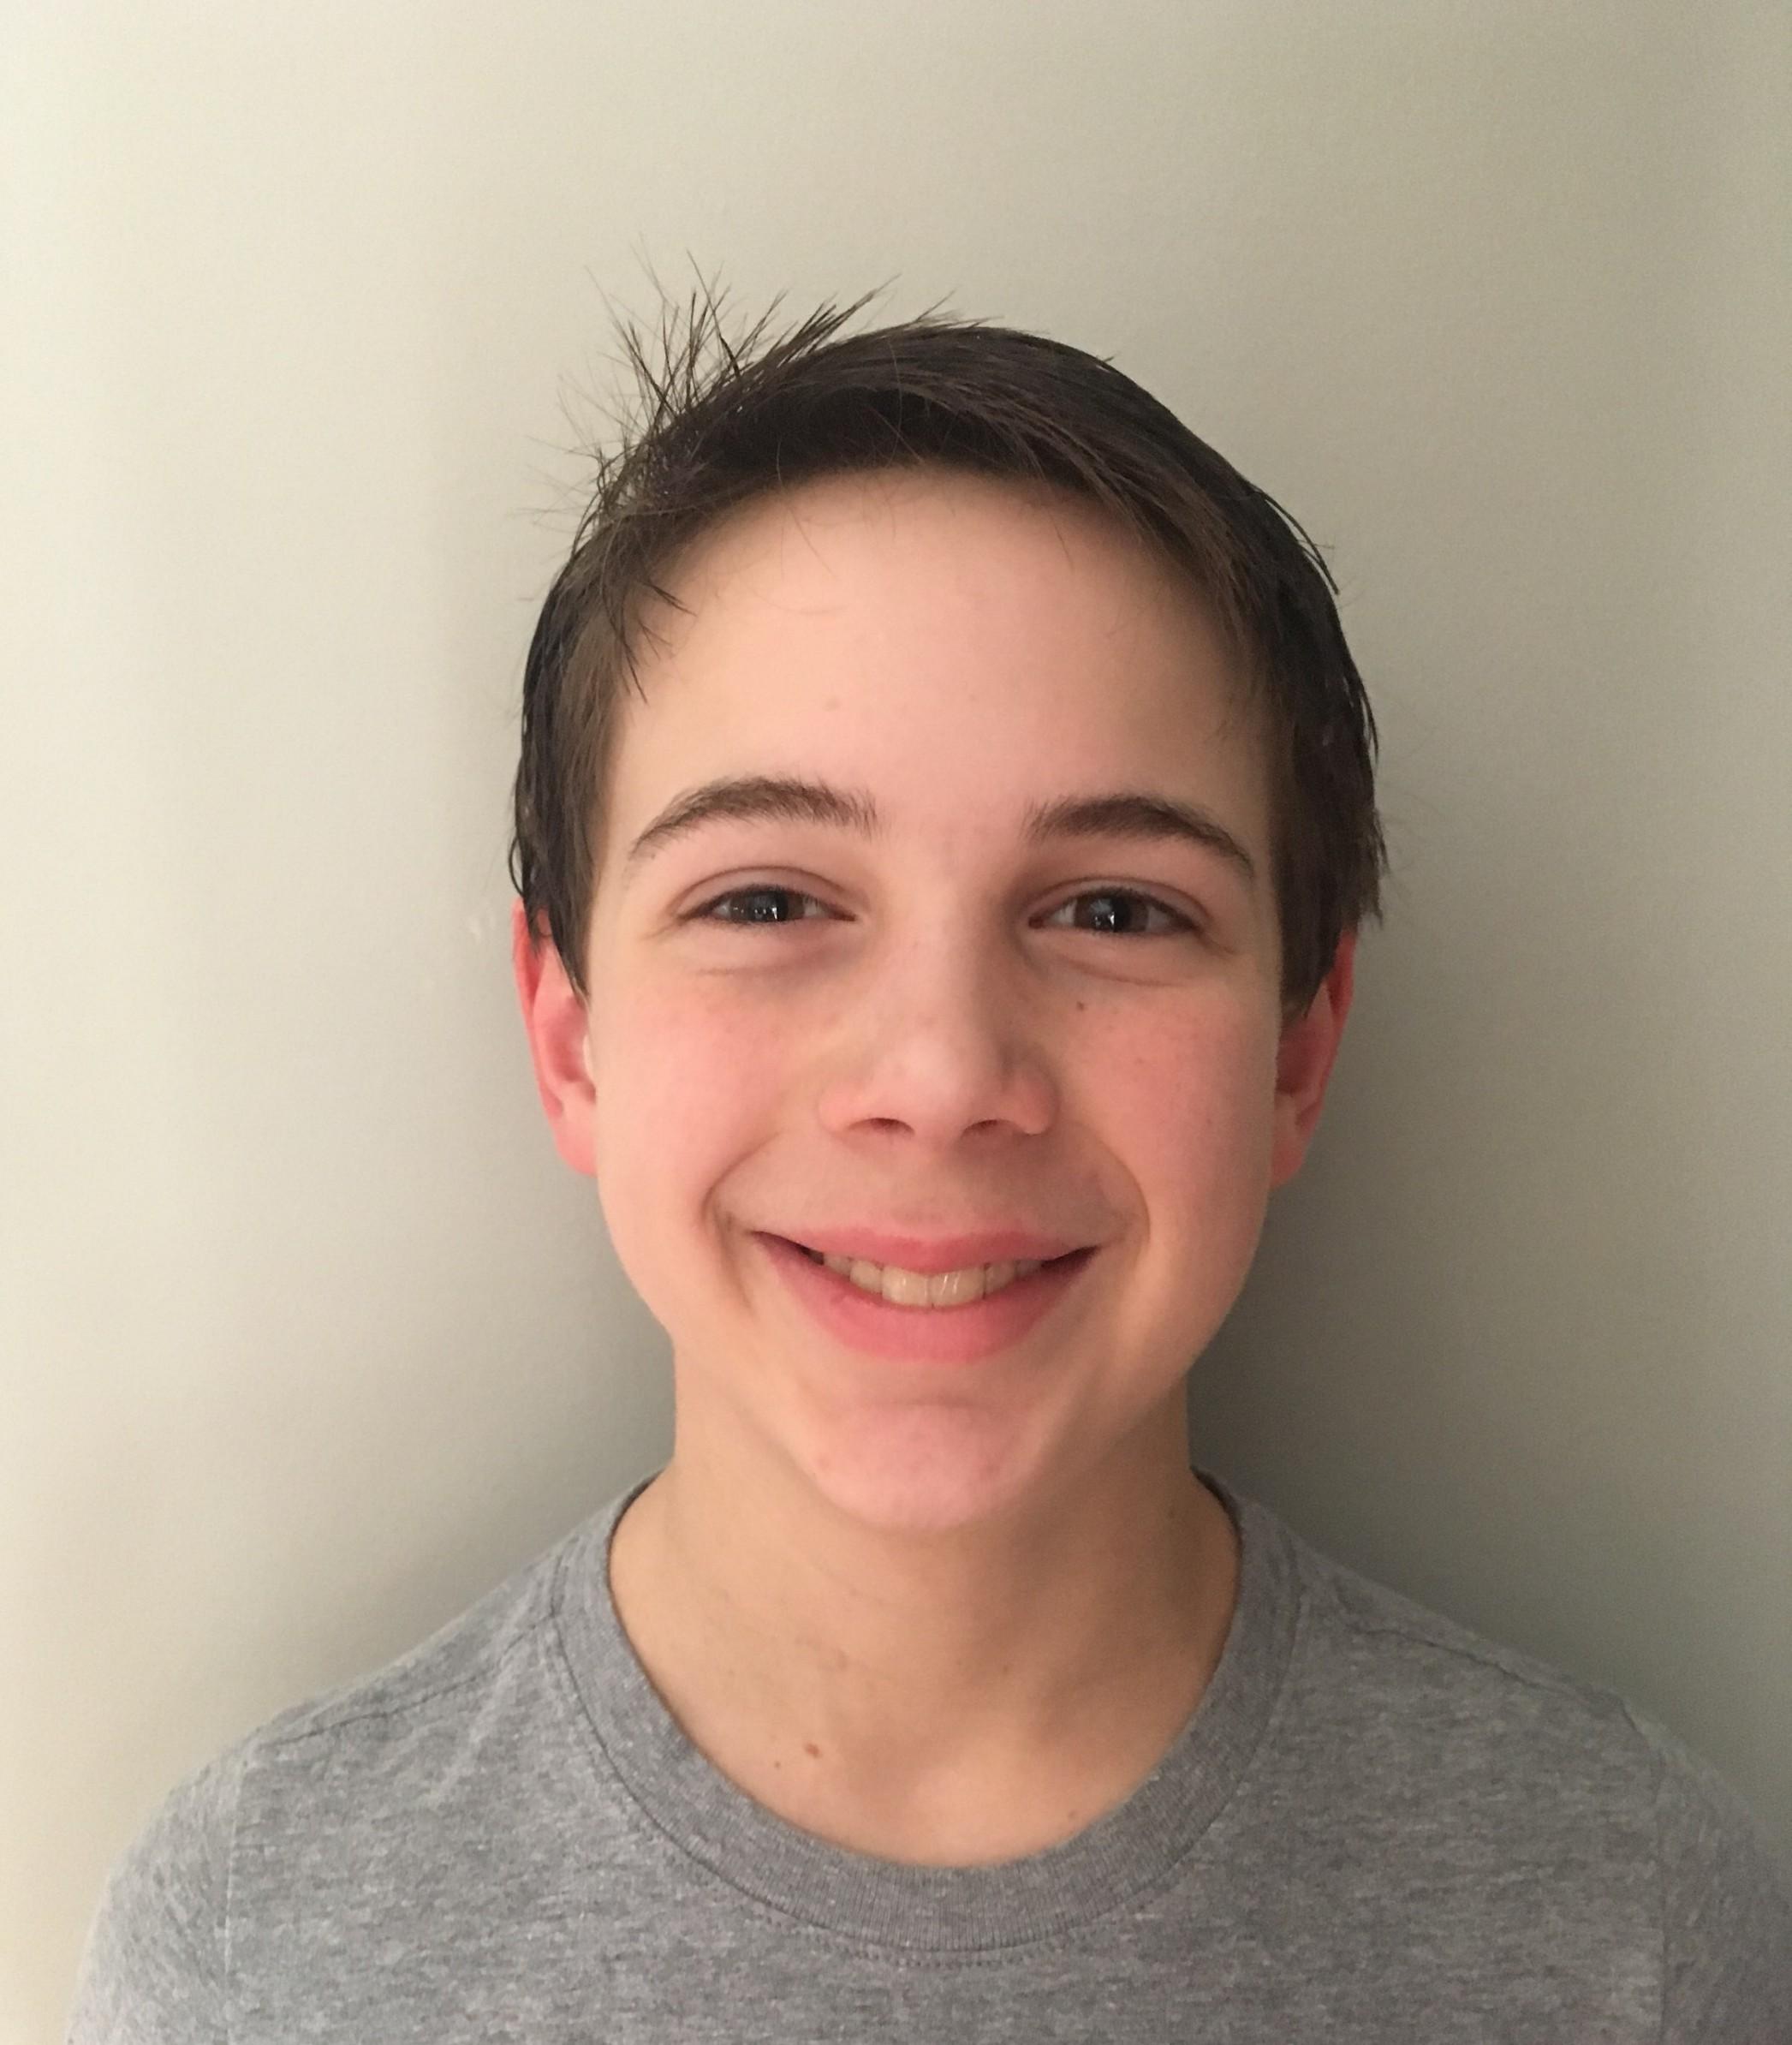 I would play ice hockey because I like field hockey and it seems fun.  Jack  Age 12